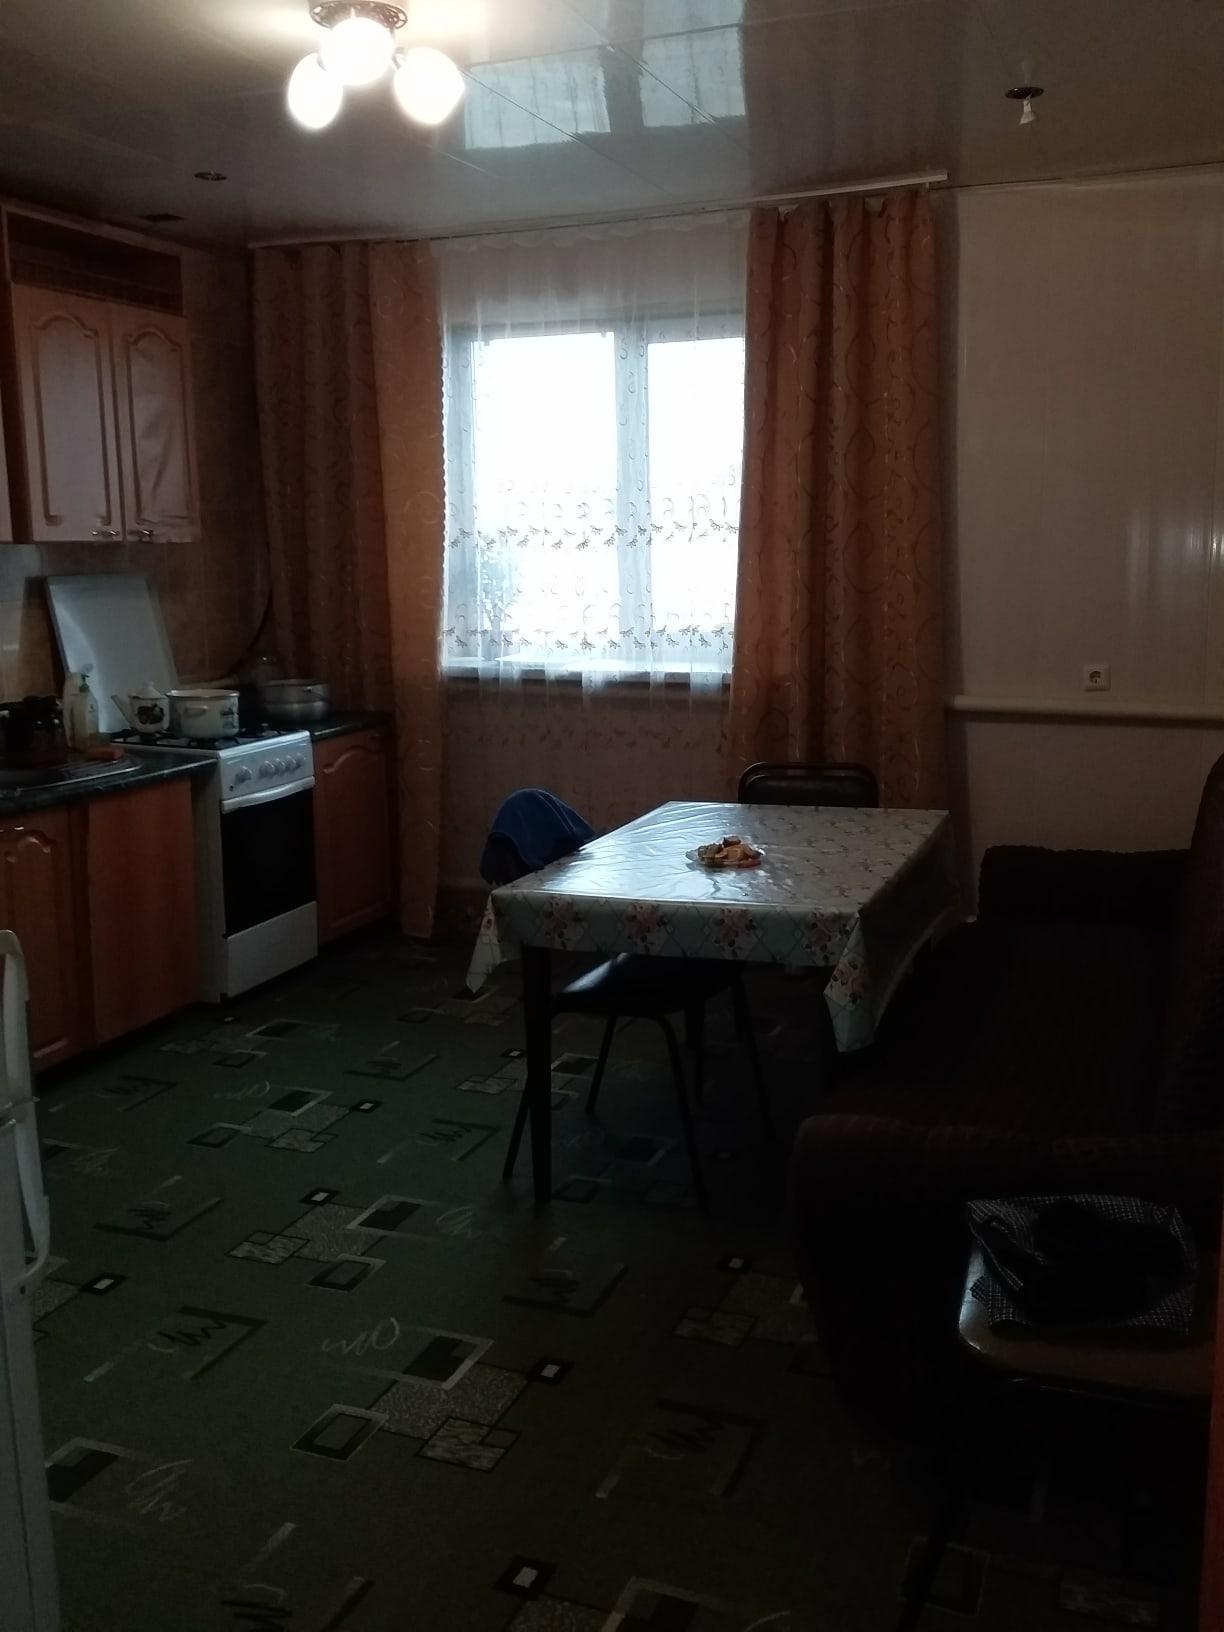 продам или обменяю на квартиру дом на | Объявления Орска и Новотроицка №2594